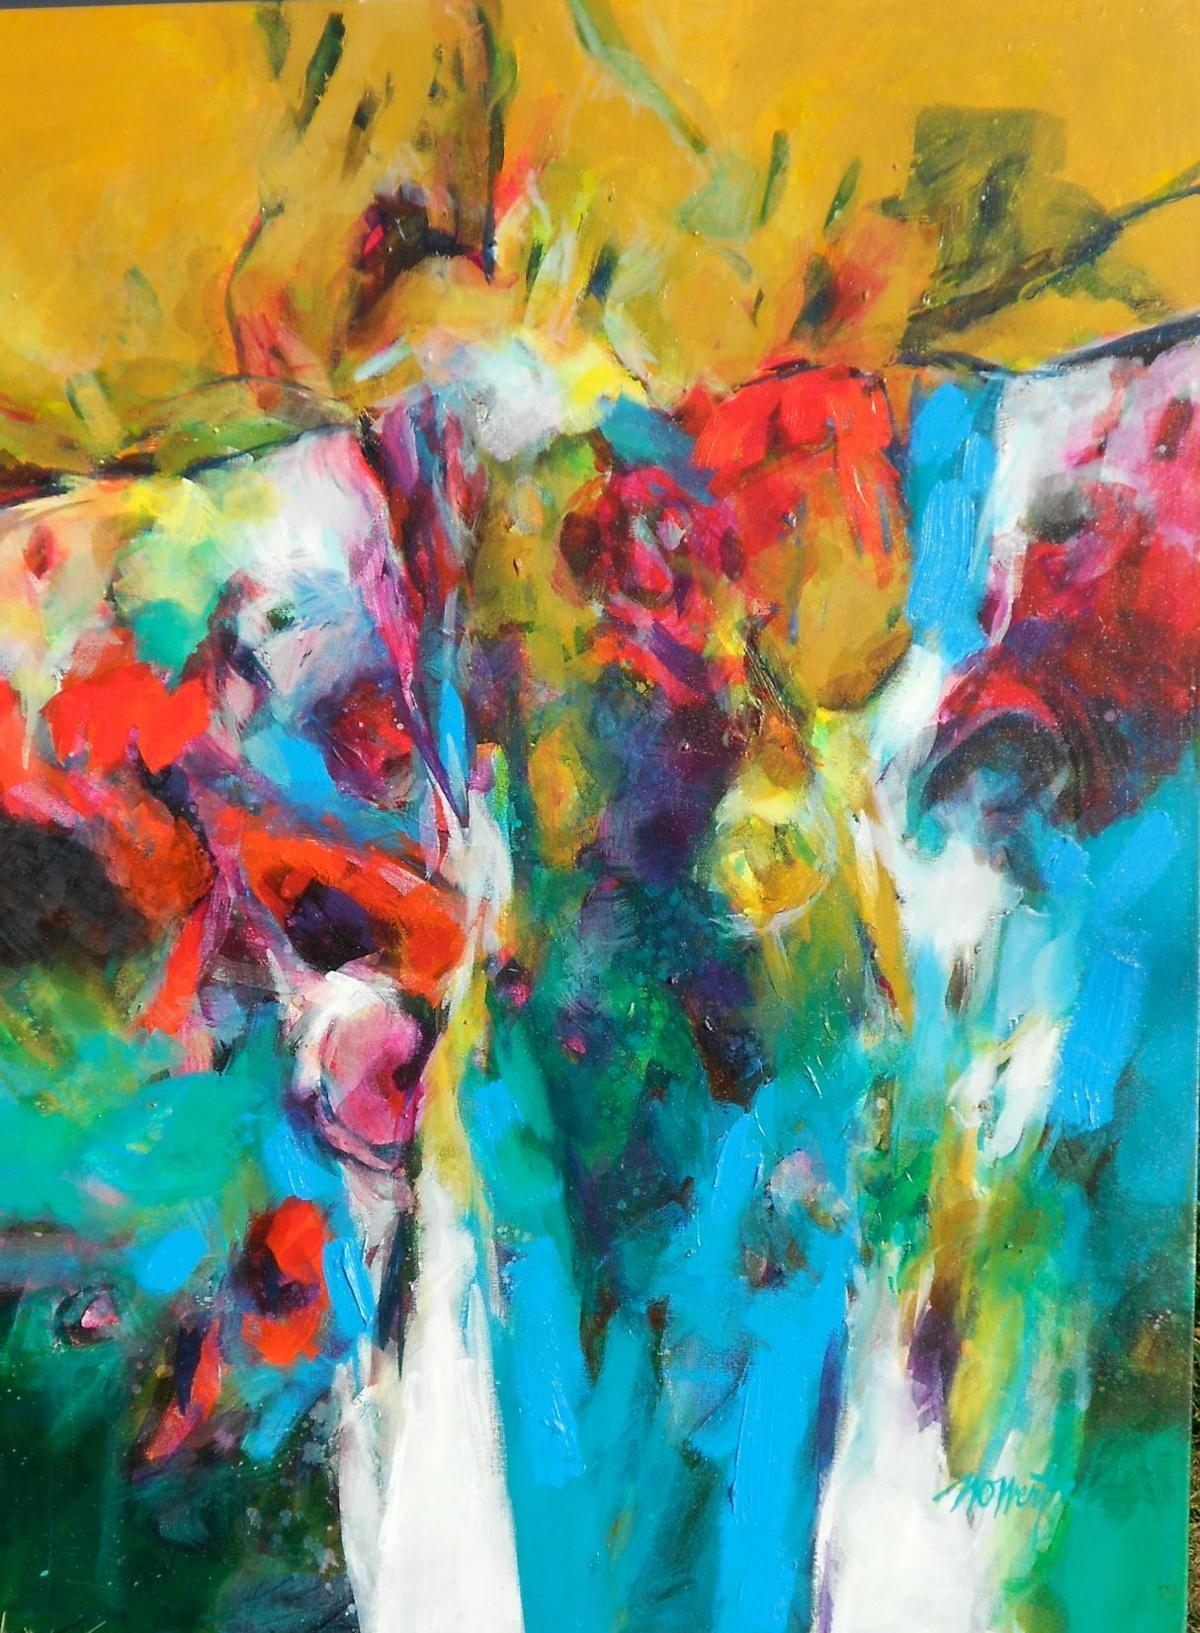 Wert lehman open colorful show at arts hotel art for Penn state lehman craft fair 2017